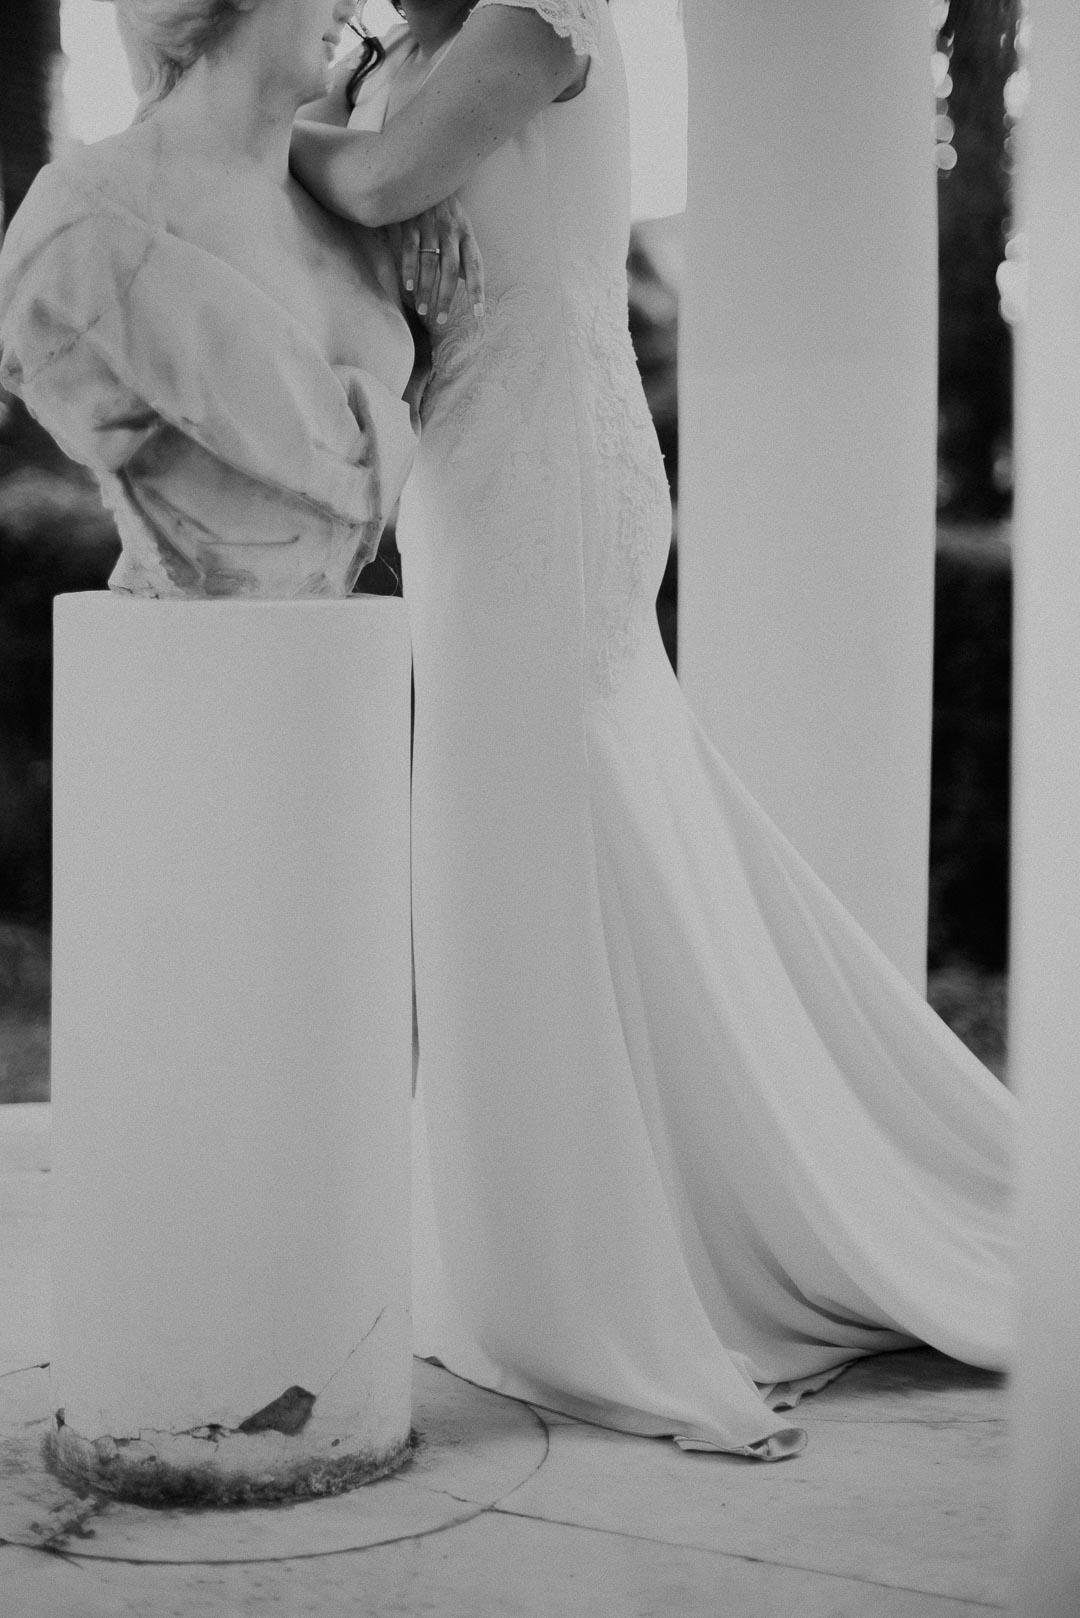 wedding-photographer-destination-fineart-bespoke-reportage-sorrento-parcodeiprincipi-vivianeizzo-spazio46-76